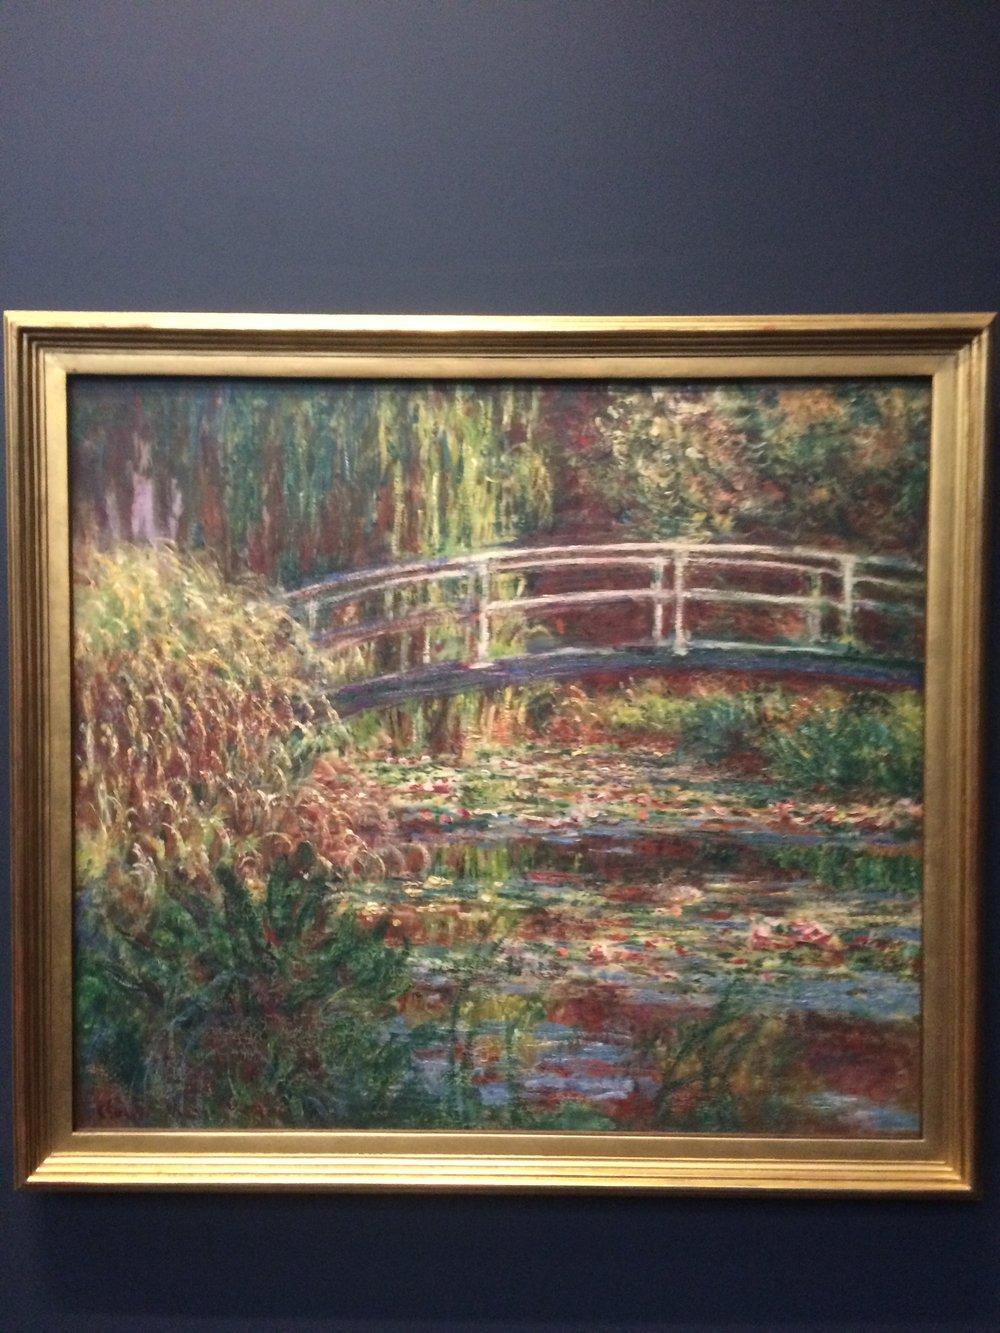 Monet, Le Bassin aux nympheas, harmony rose  (1900).